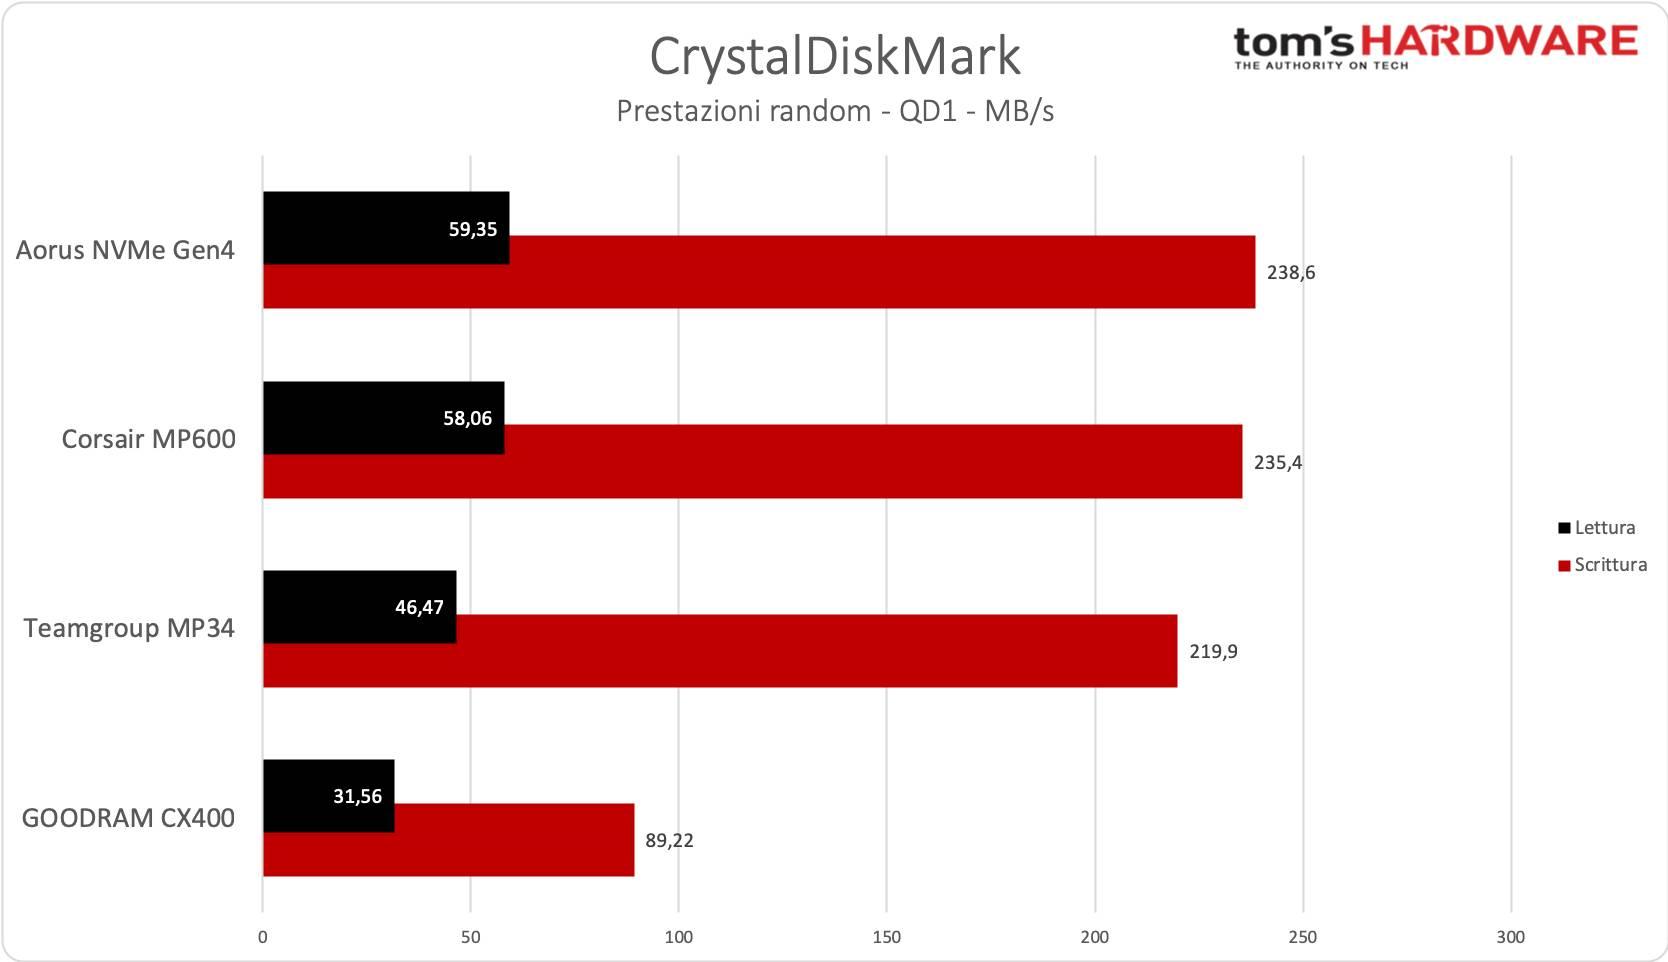 Benchmark SSD - CrystalDiskMark, random